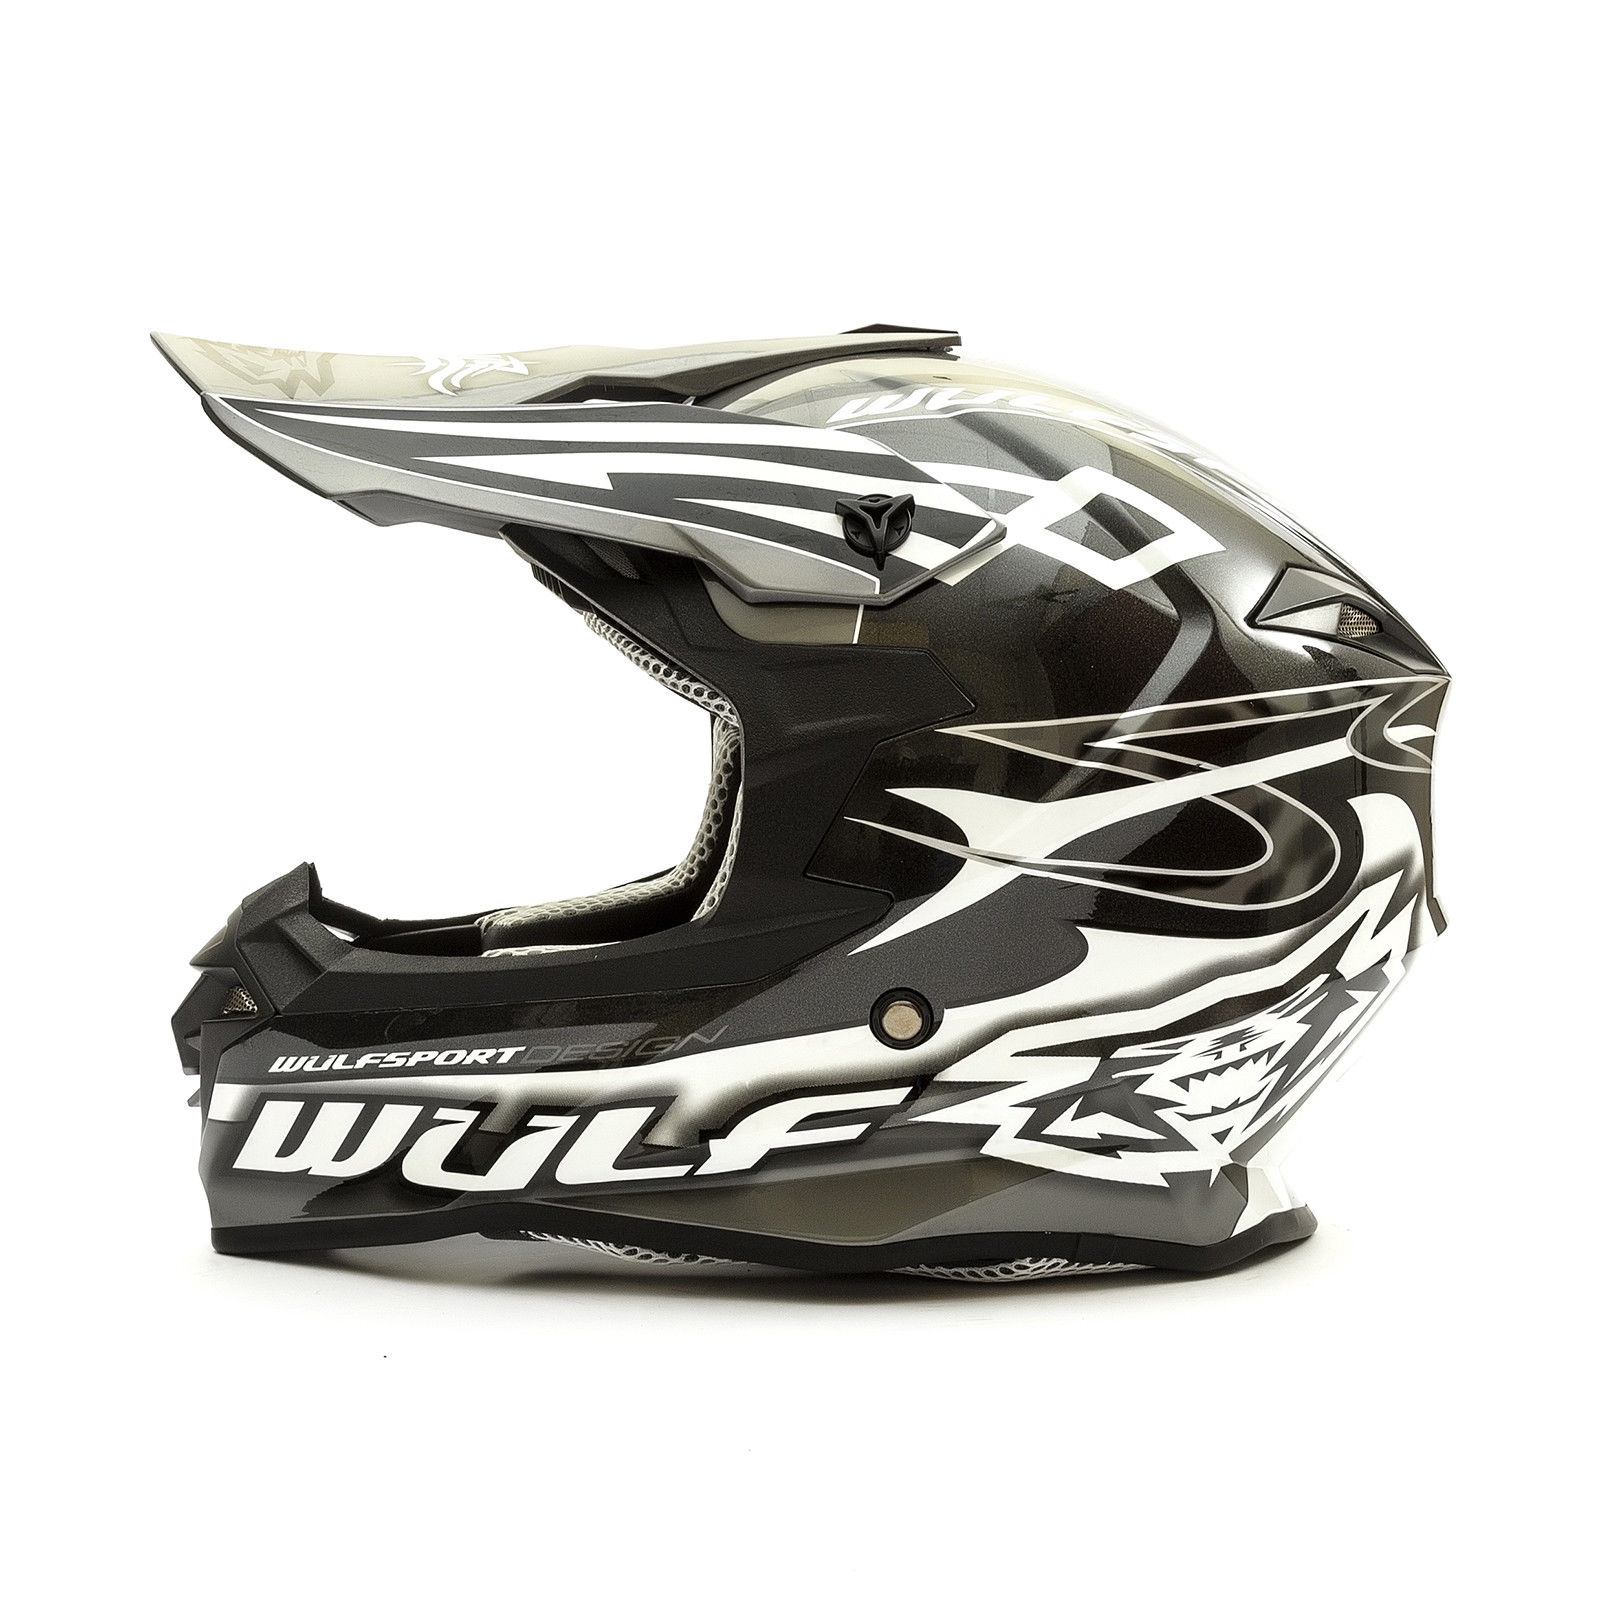 Wulfsport-Adult-Sceptre-Helmets-Motocross-Pitbike-Motorbike-Off-Road-Racing-ATV thumbnail 11